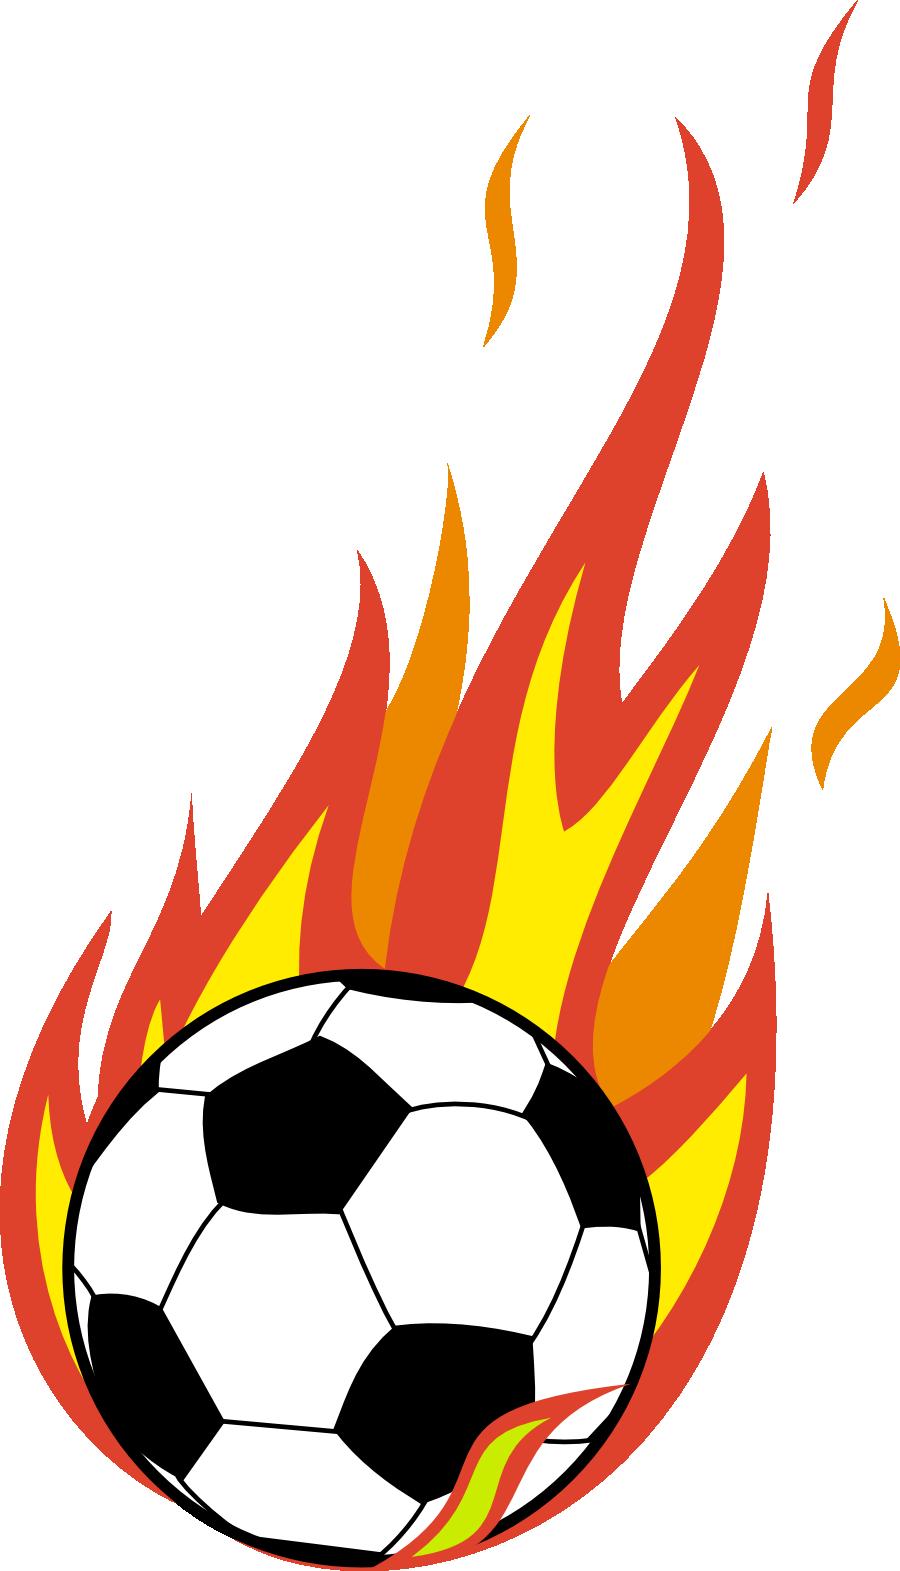 Soccer Ball Clipart - Clipart Kid